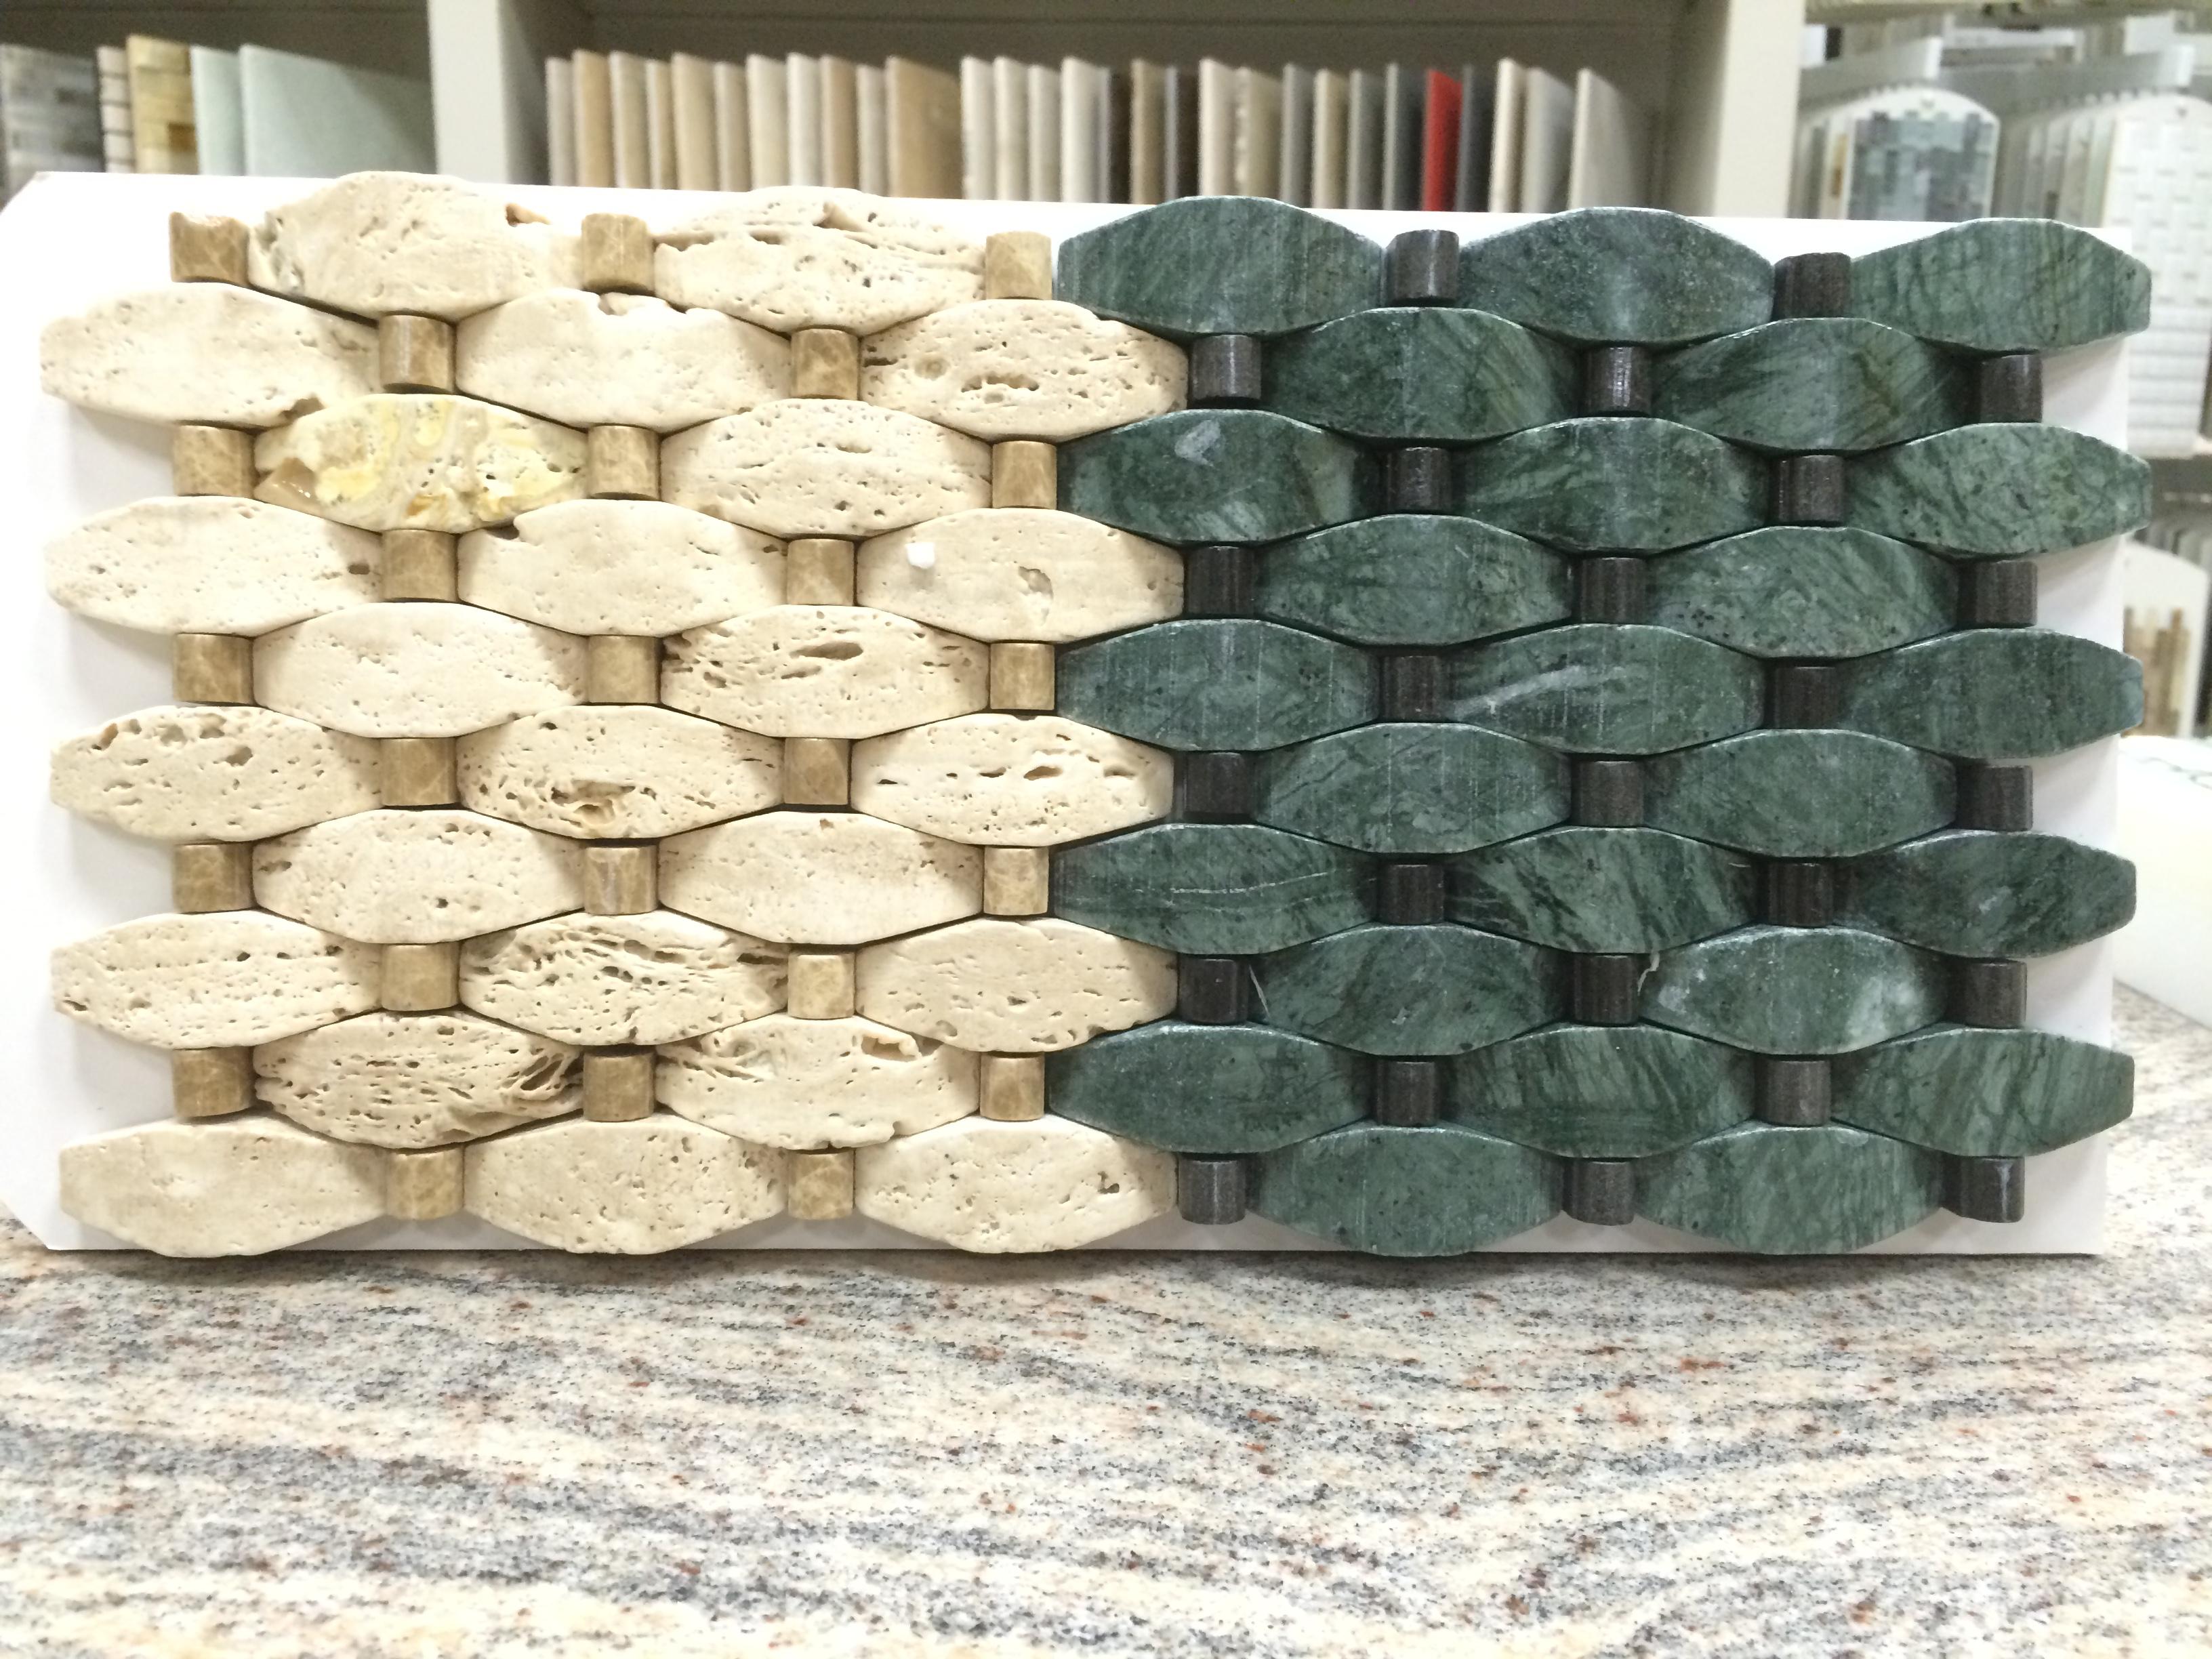 Verde-Lushan Green with Mongolia Black Dots – Stone Peak Glass Series – Glazzio Glass Tile